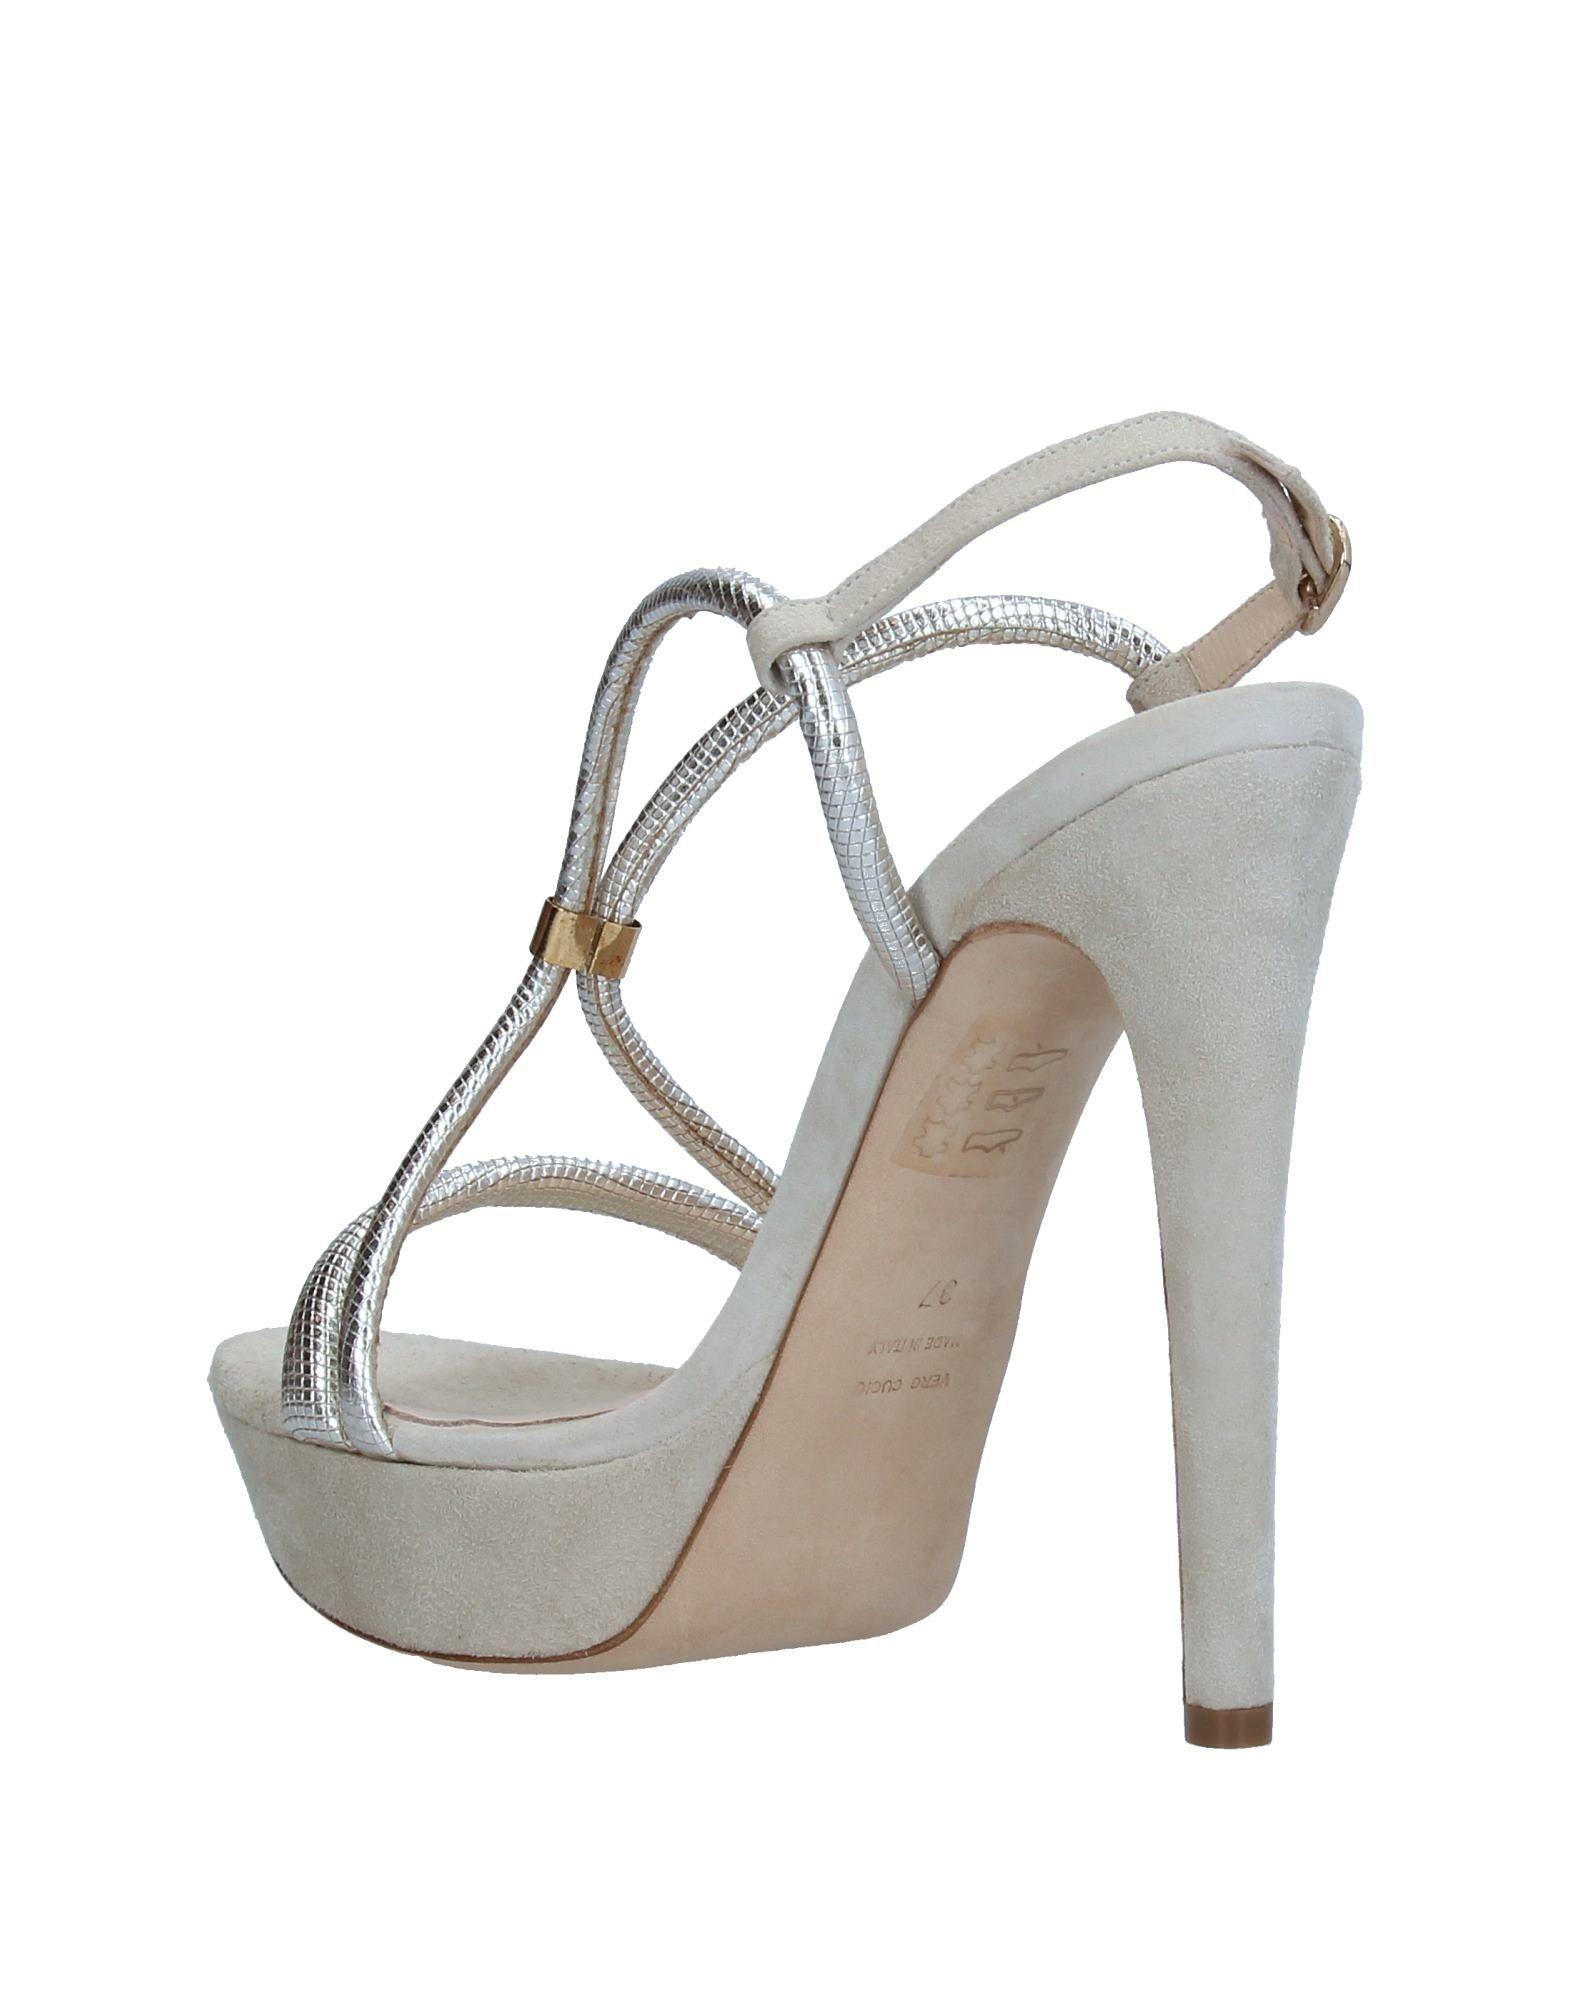 Gianni Marra Sandalen Damen  11358793SQ Gute Qualität beliebte Schuhe